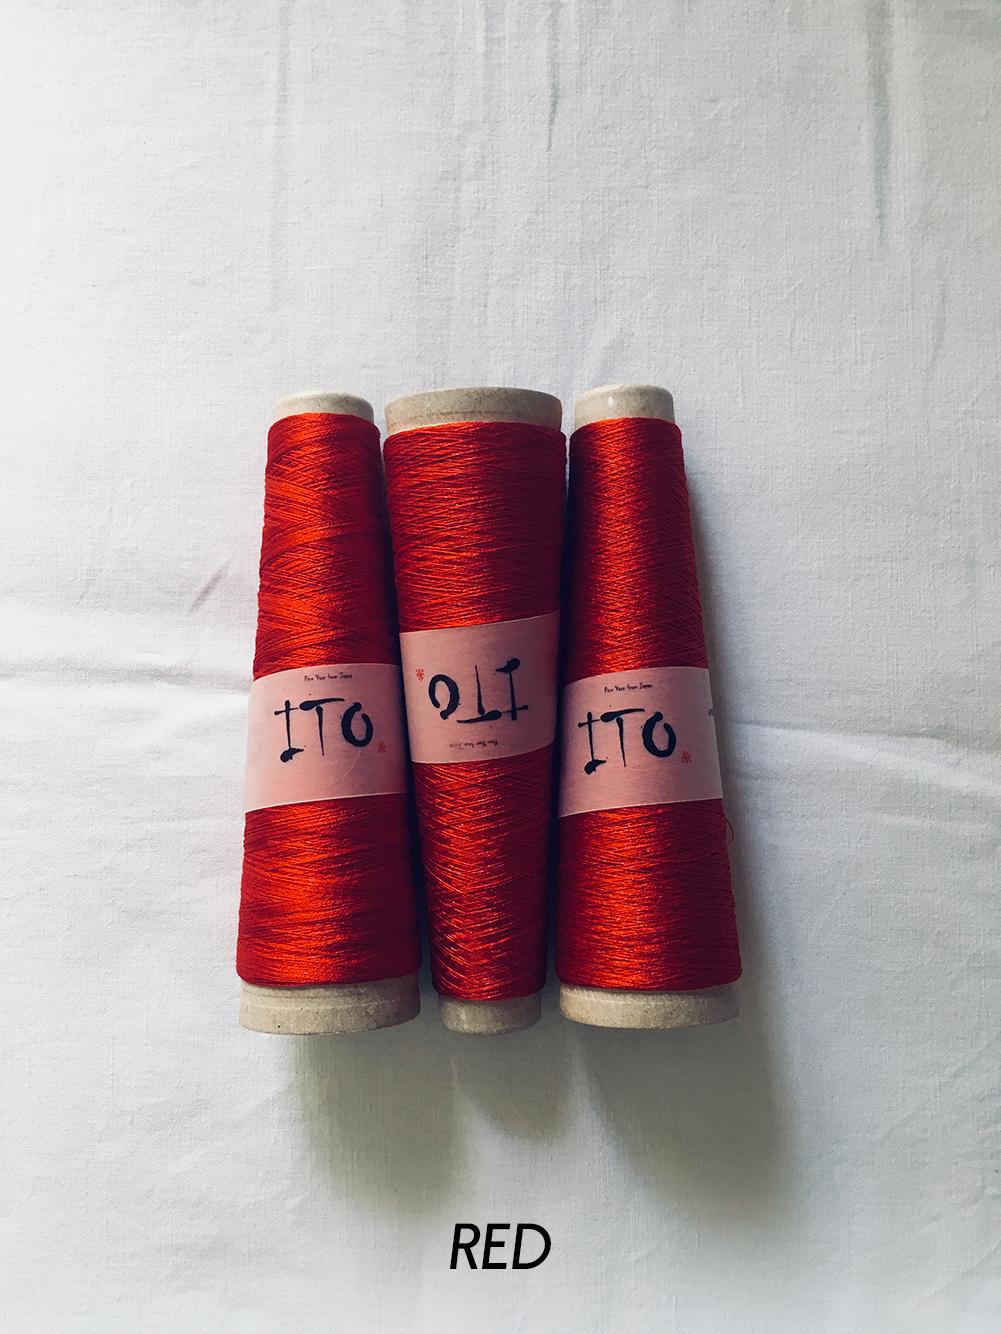 ito_tetsu_red_433_wool_done_knitting.jpg